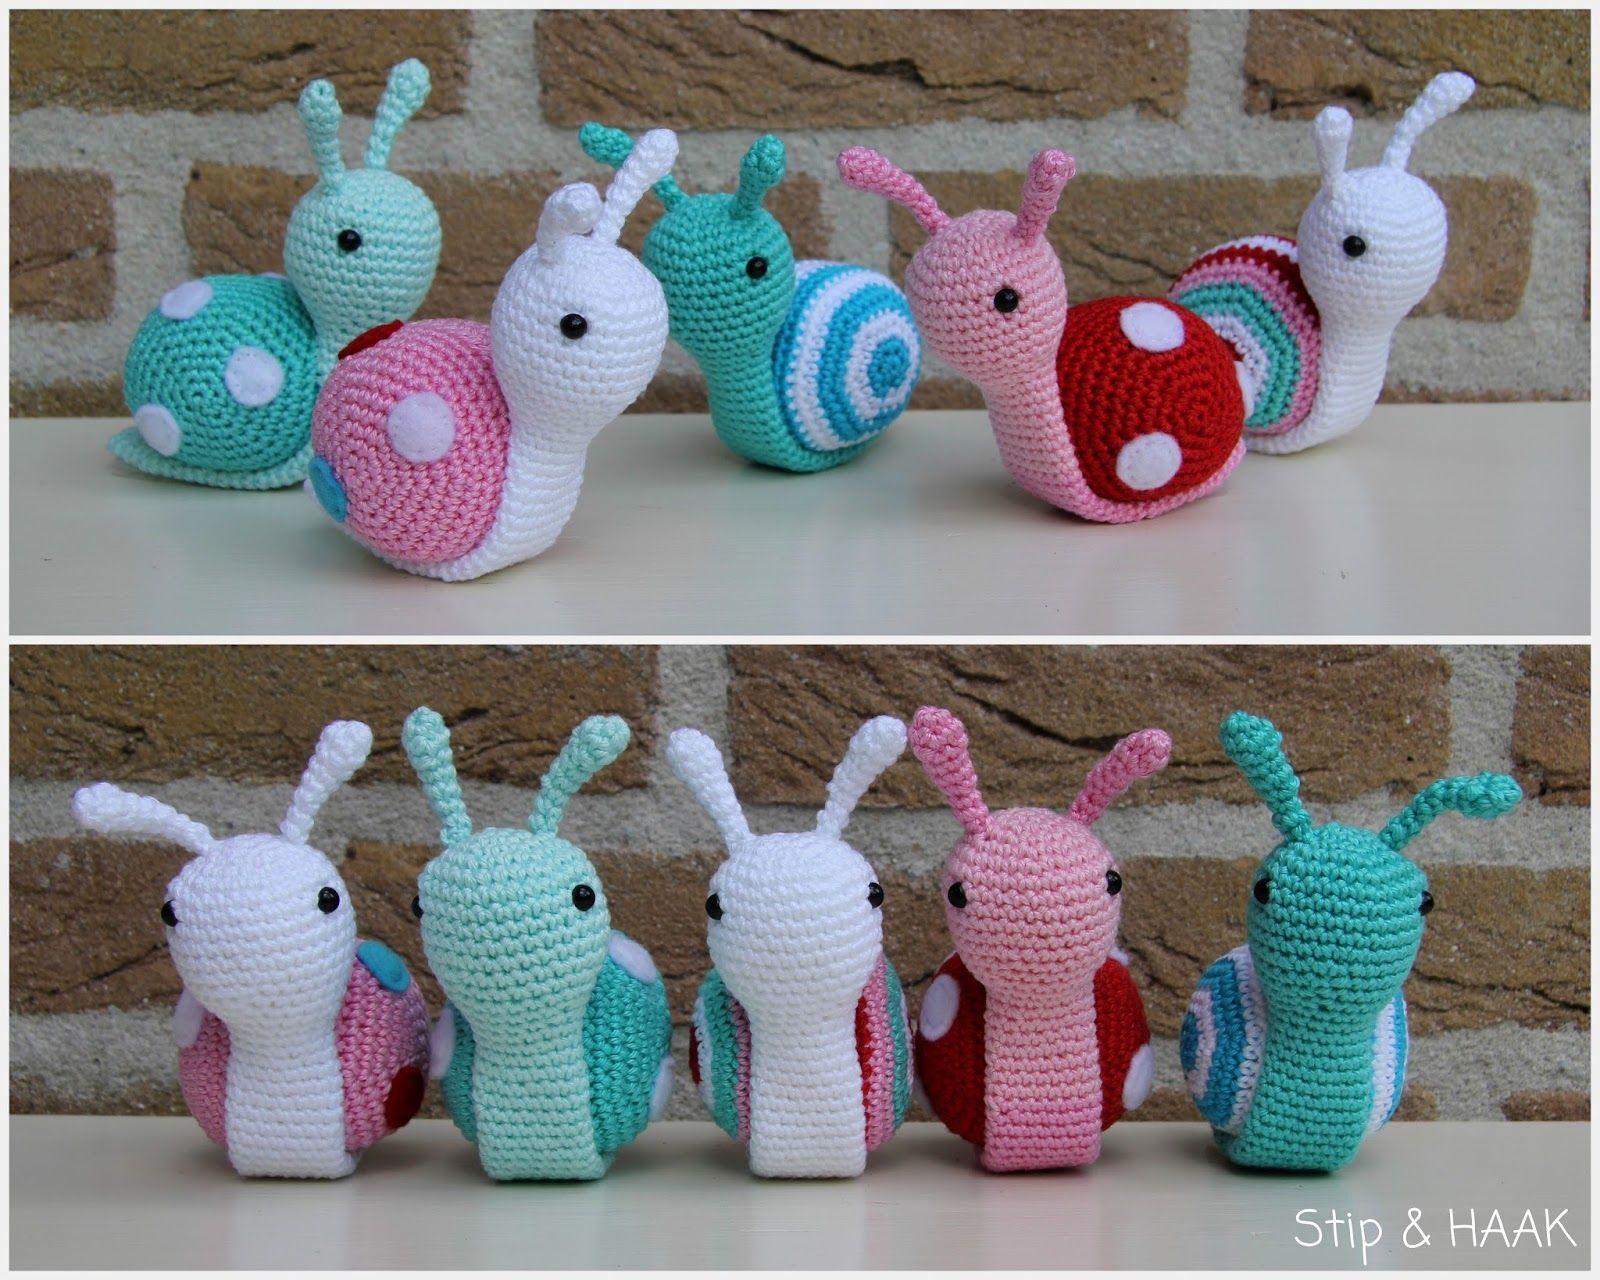 amigurumi snail free crochet pattern [ 1600 x 1280 Pixel ]